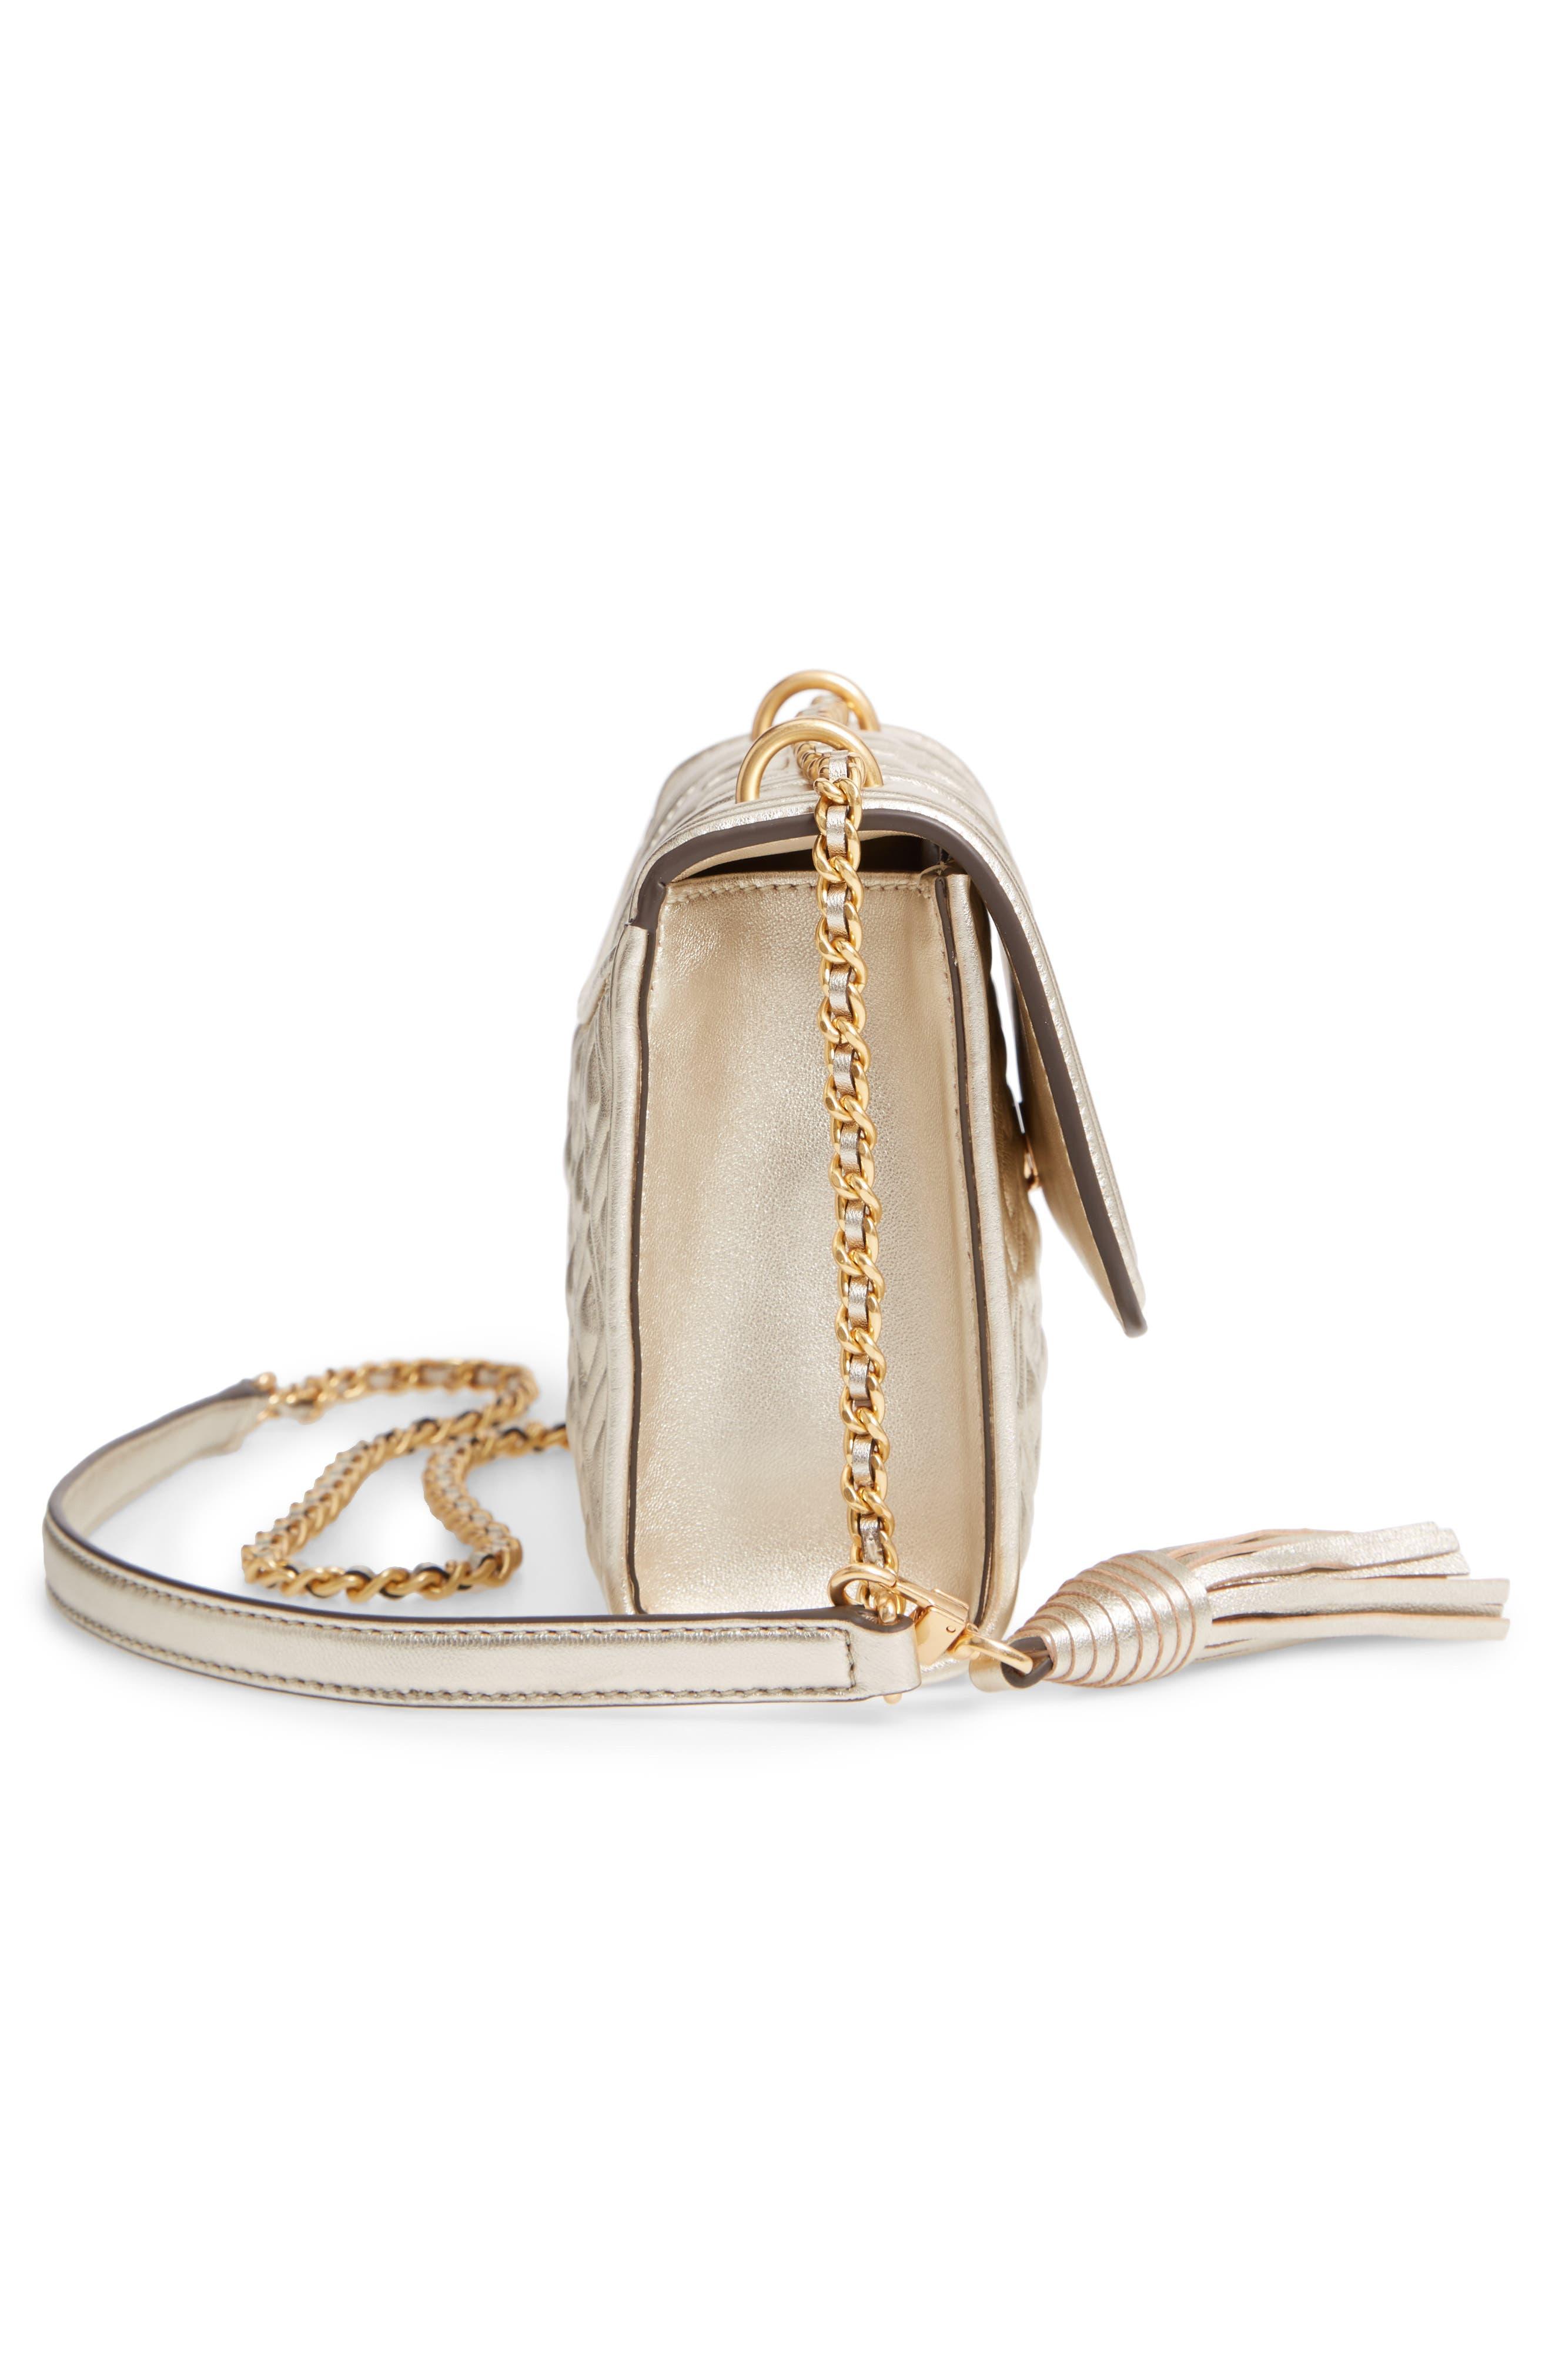 TORY BURCH,                             Small Fleming Metallic Lambskin Leather Convertible Shoulder Bag,                             Alternate thumbnail 5, color,                             100